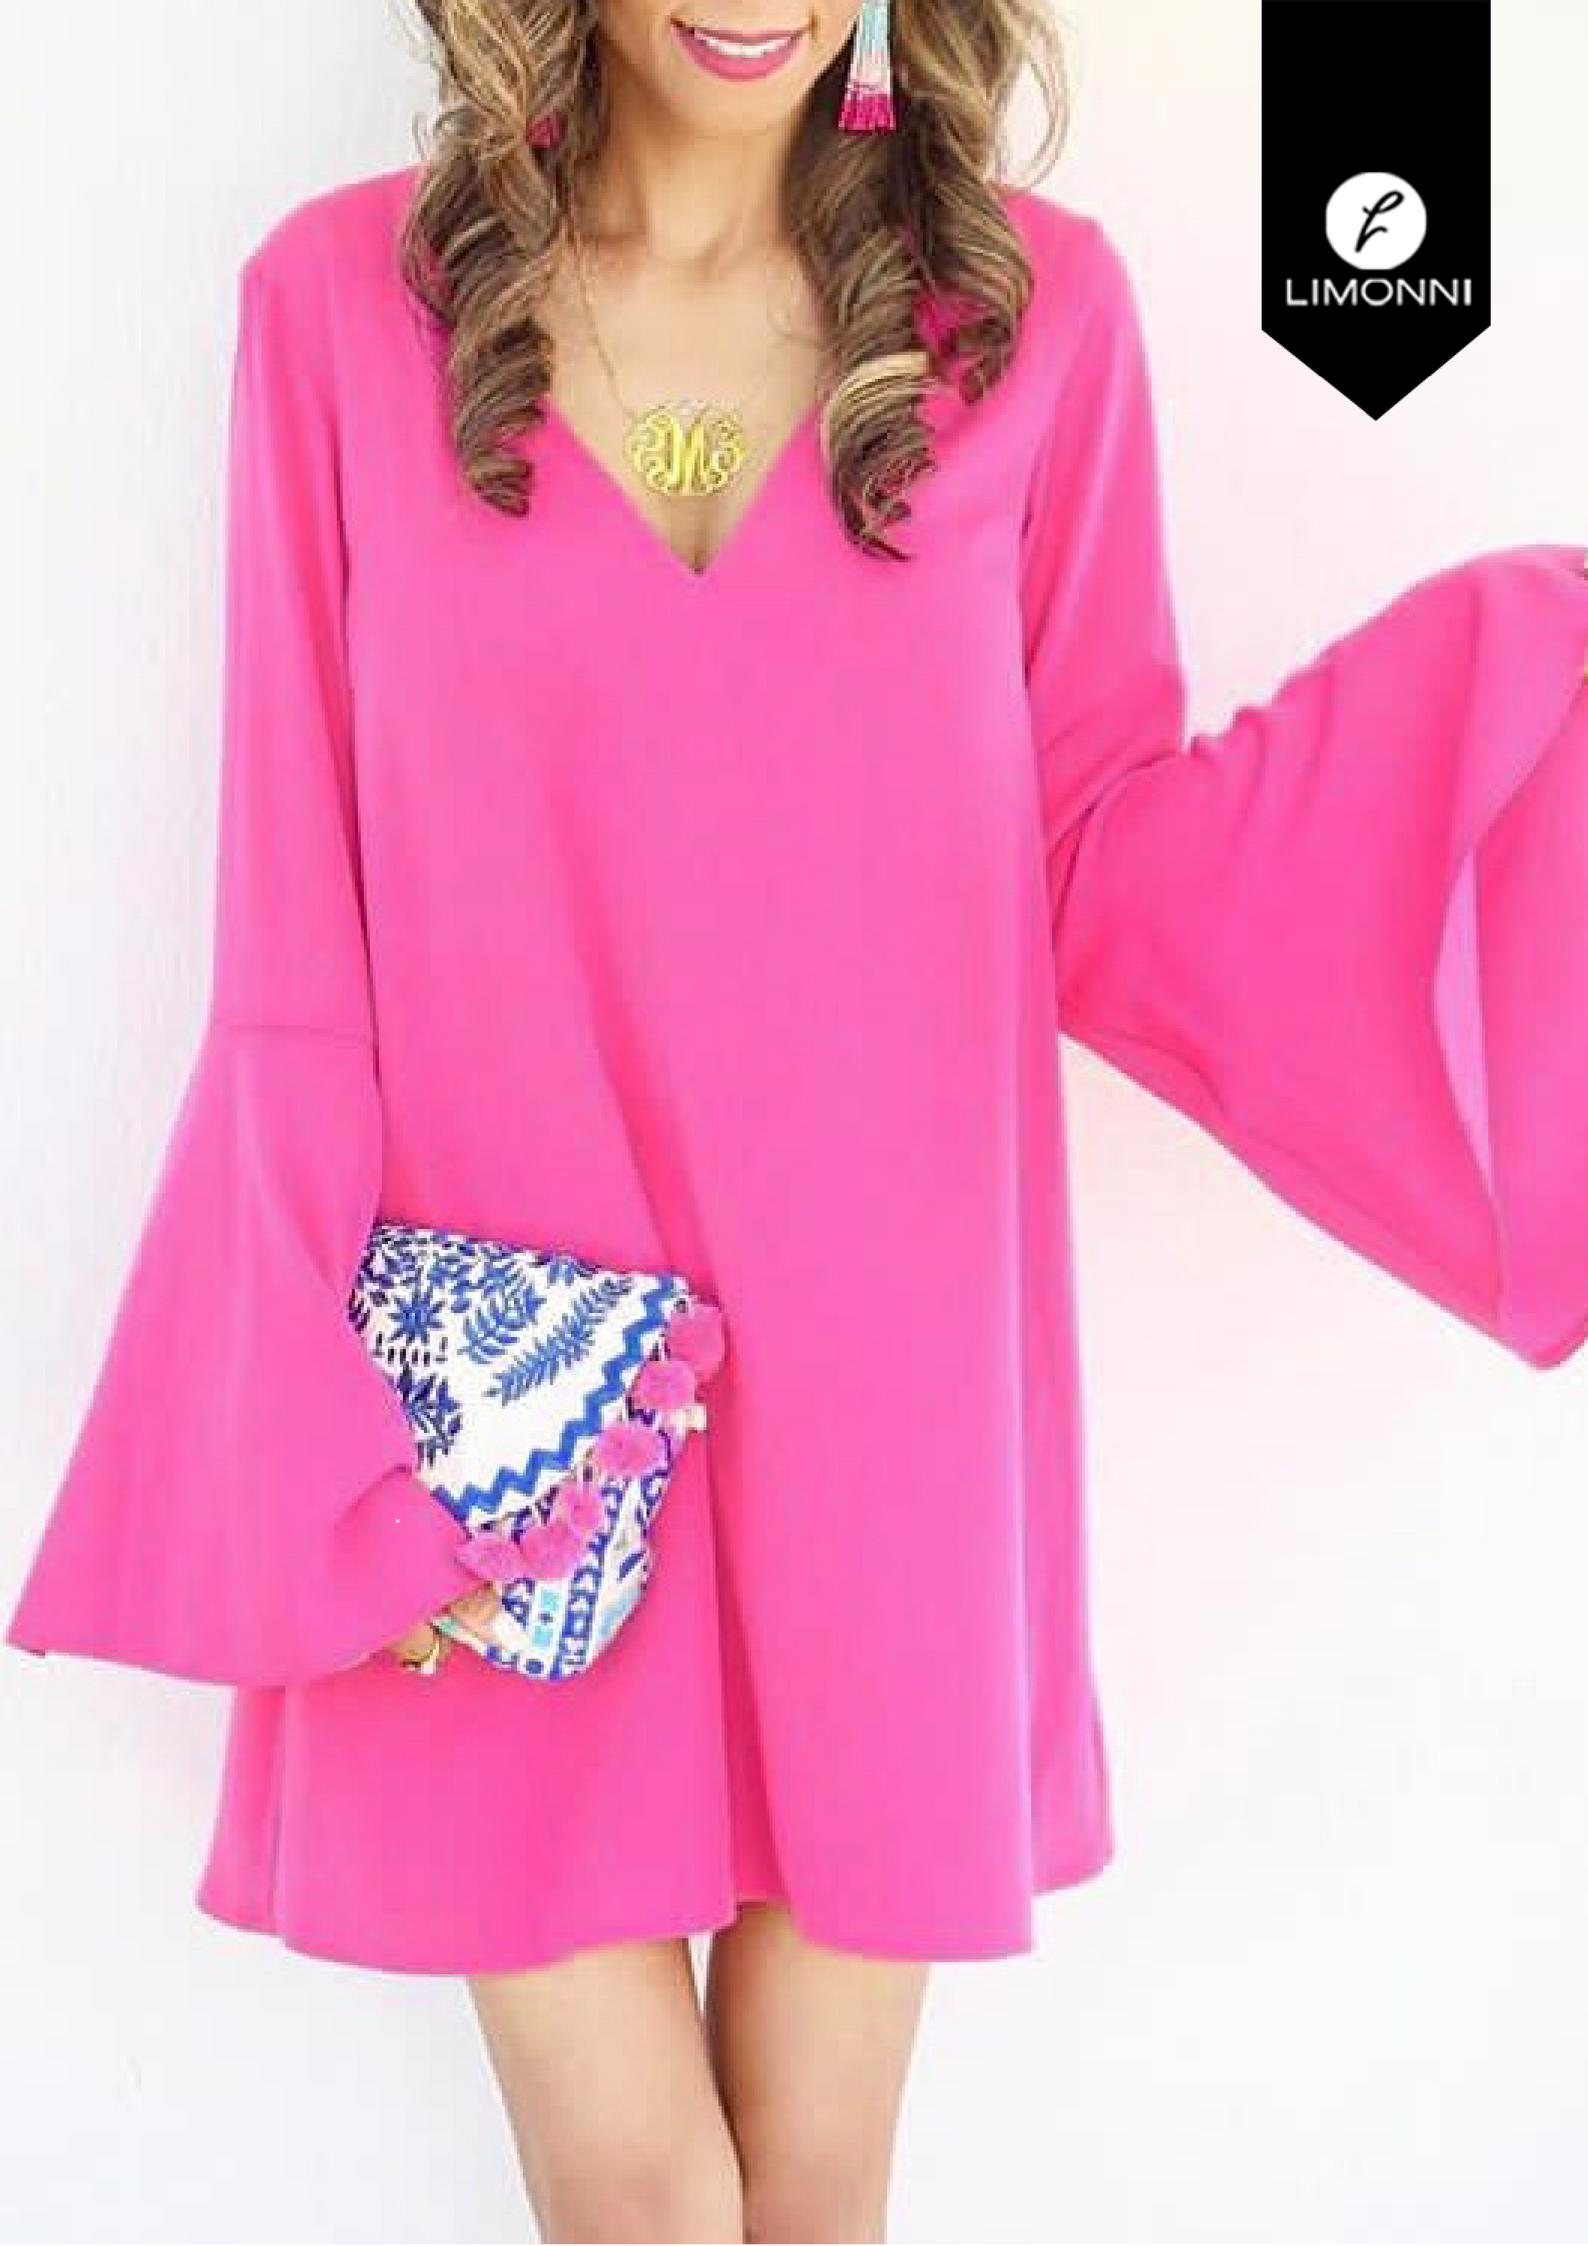 Vestidos para mujer Limonni Bennett LI1321 Cortos Casuales